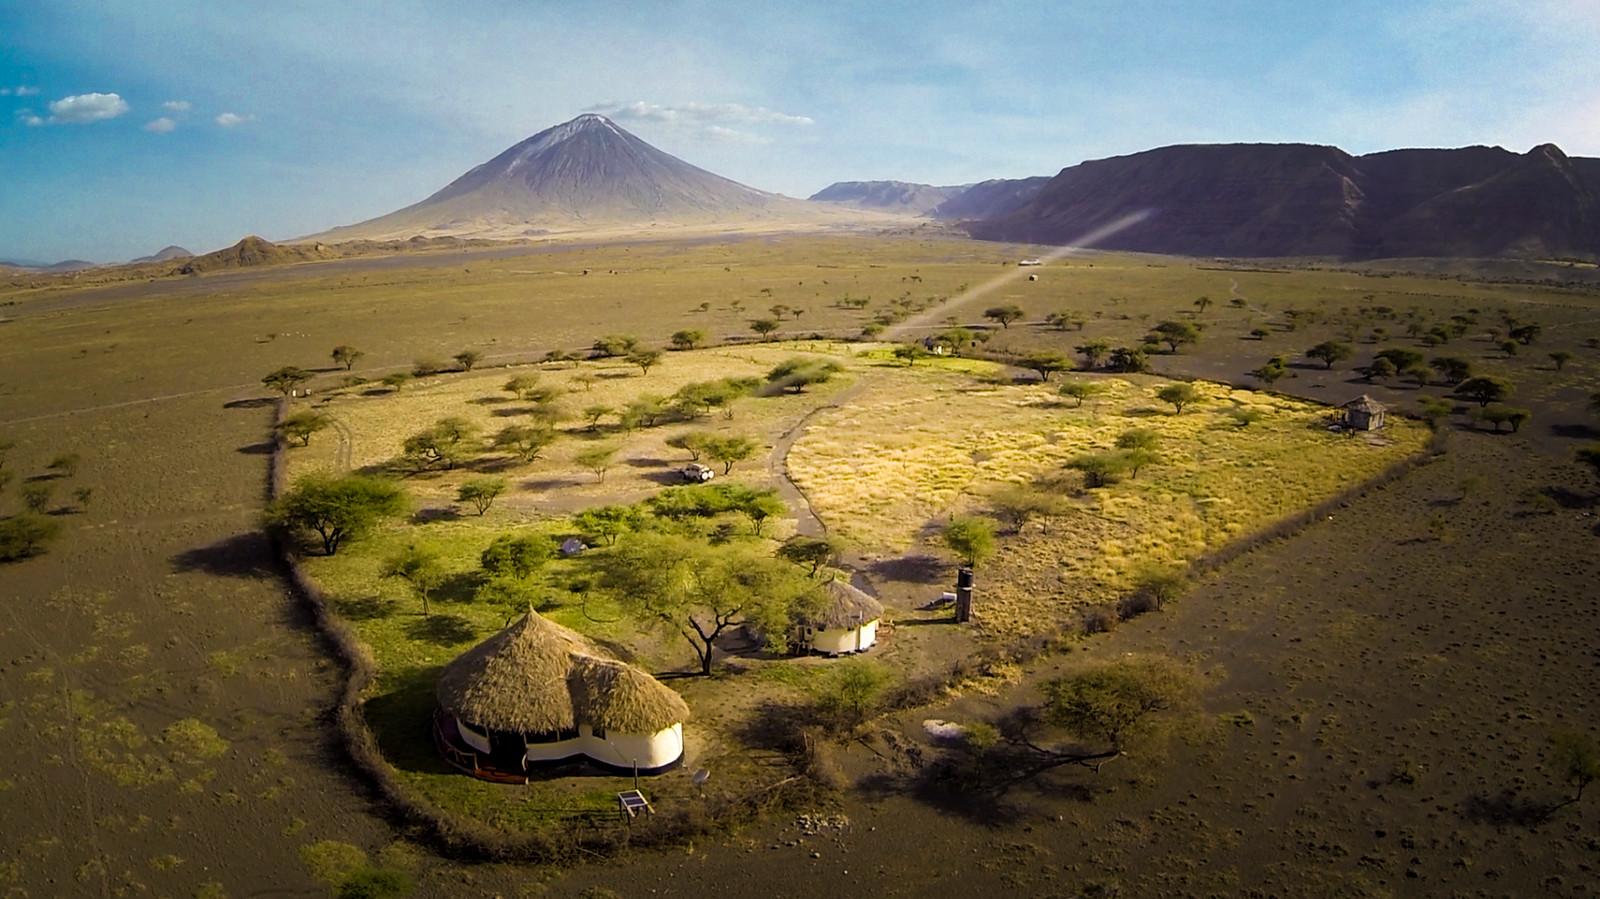 Native Massai | Lake Natron, Tanzania, meet massai tribes